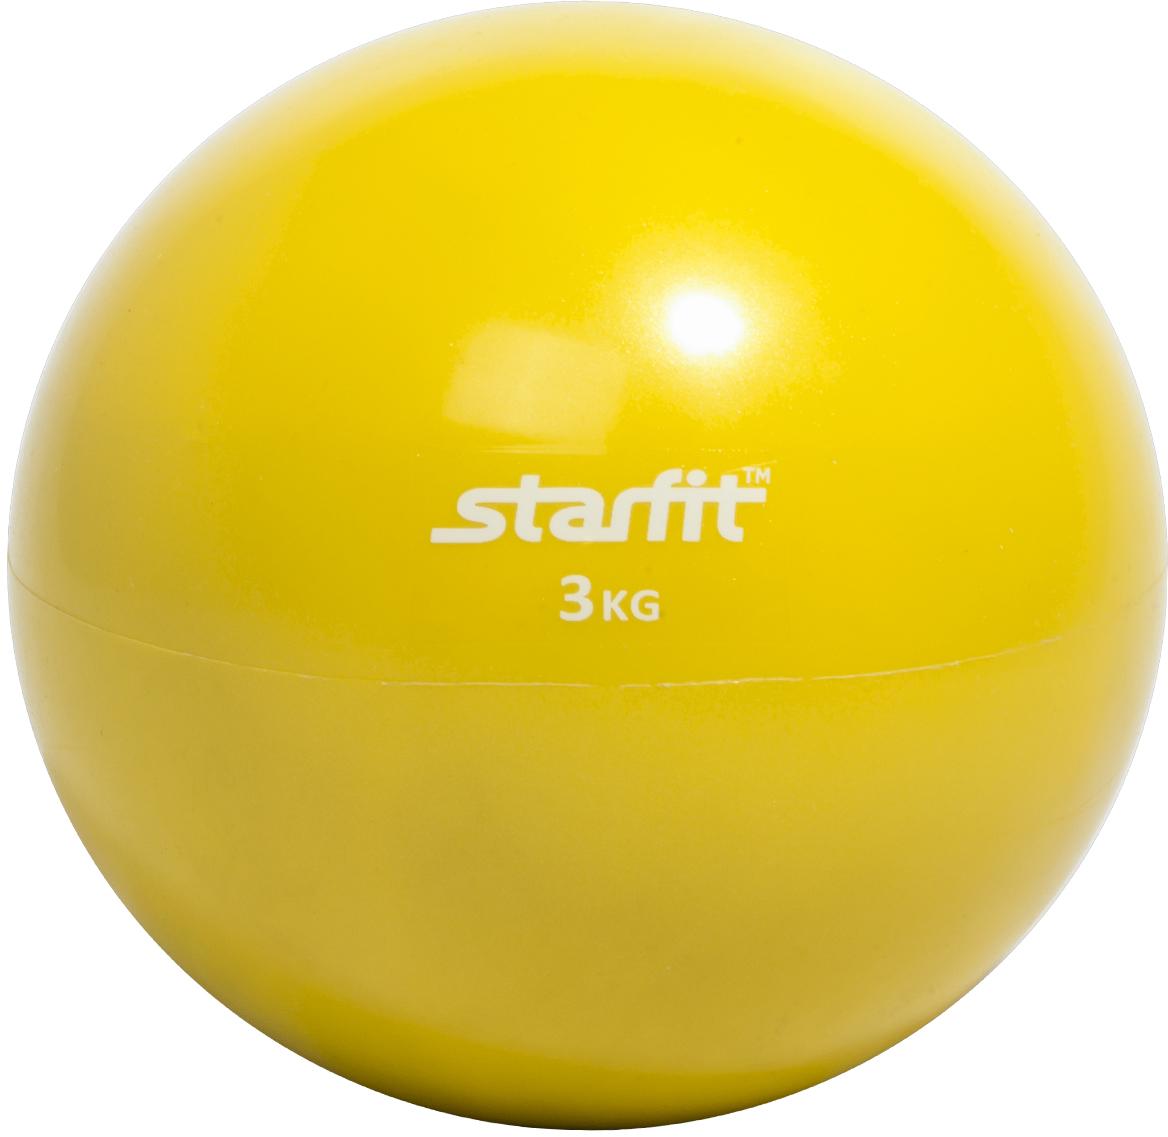 Медицинбол Starfit GB-703, цвет: желтый, 3 кг эспандеры starfit эспандер starfit es 702 power twister черный 50 кг